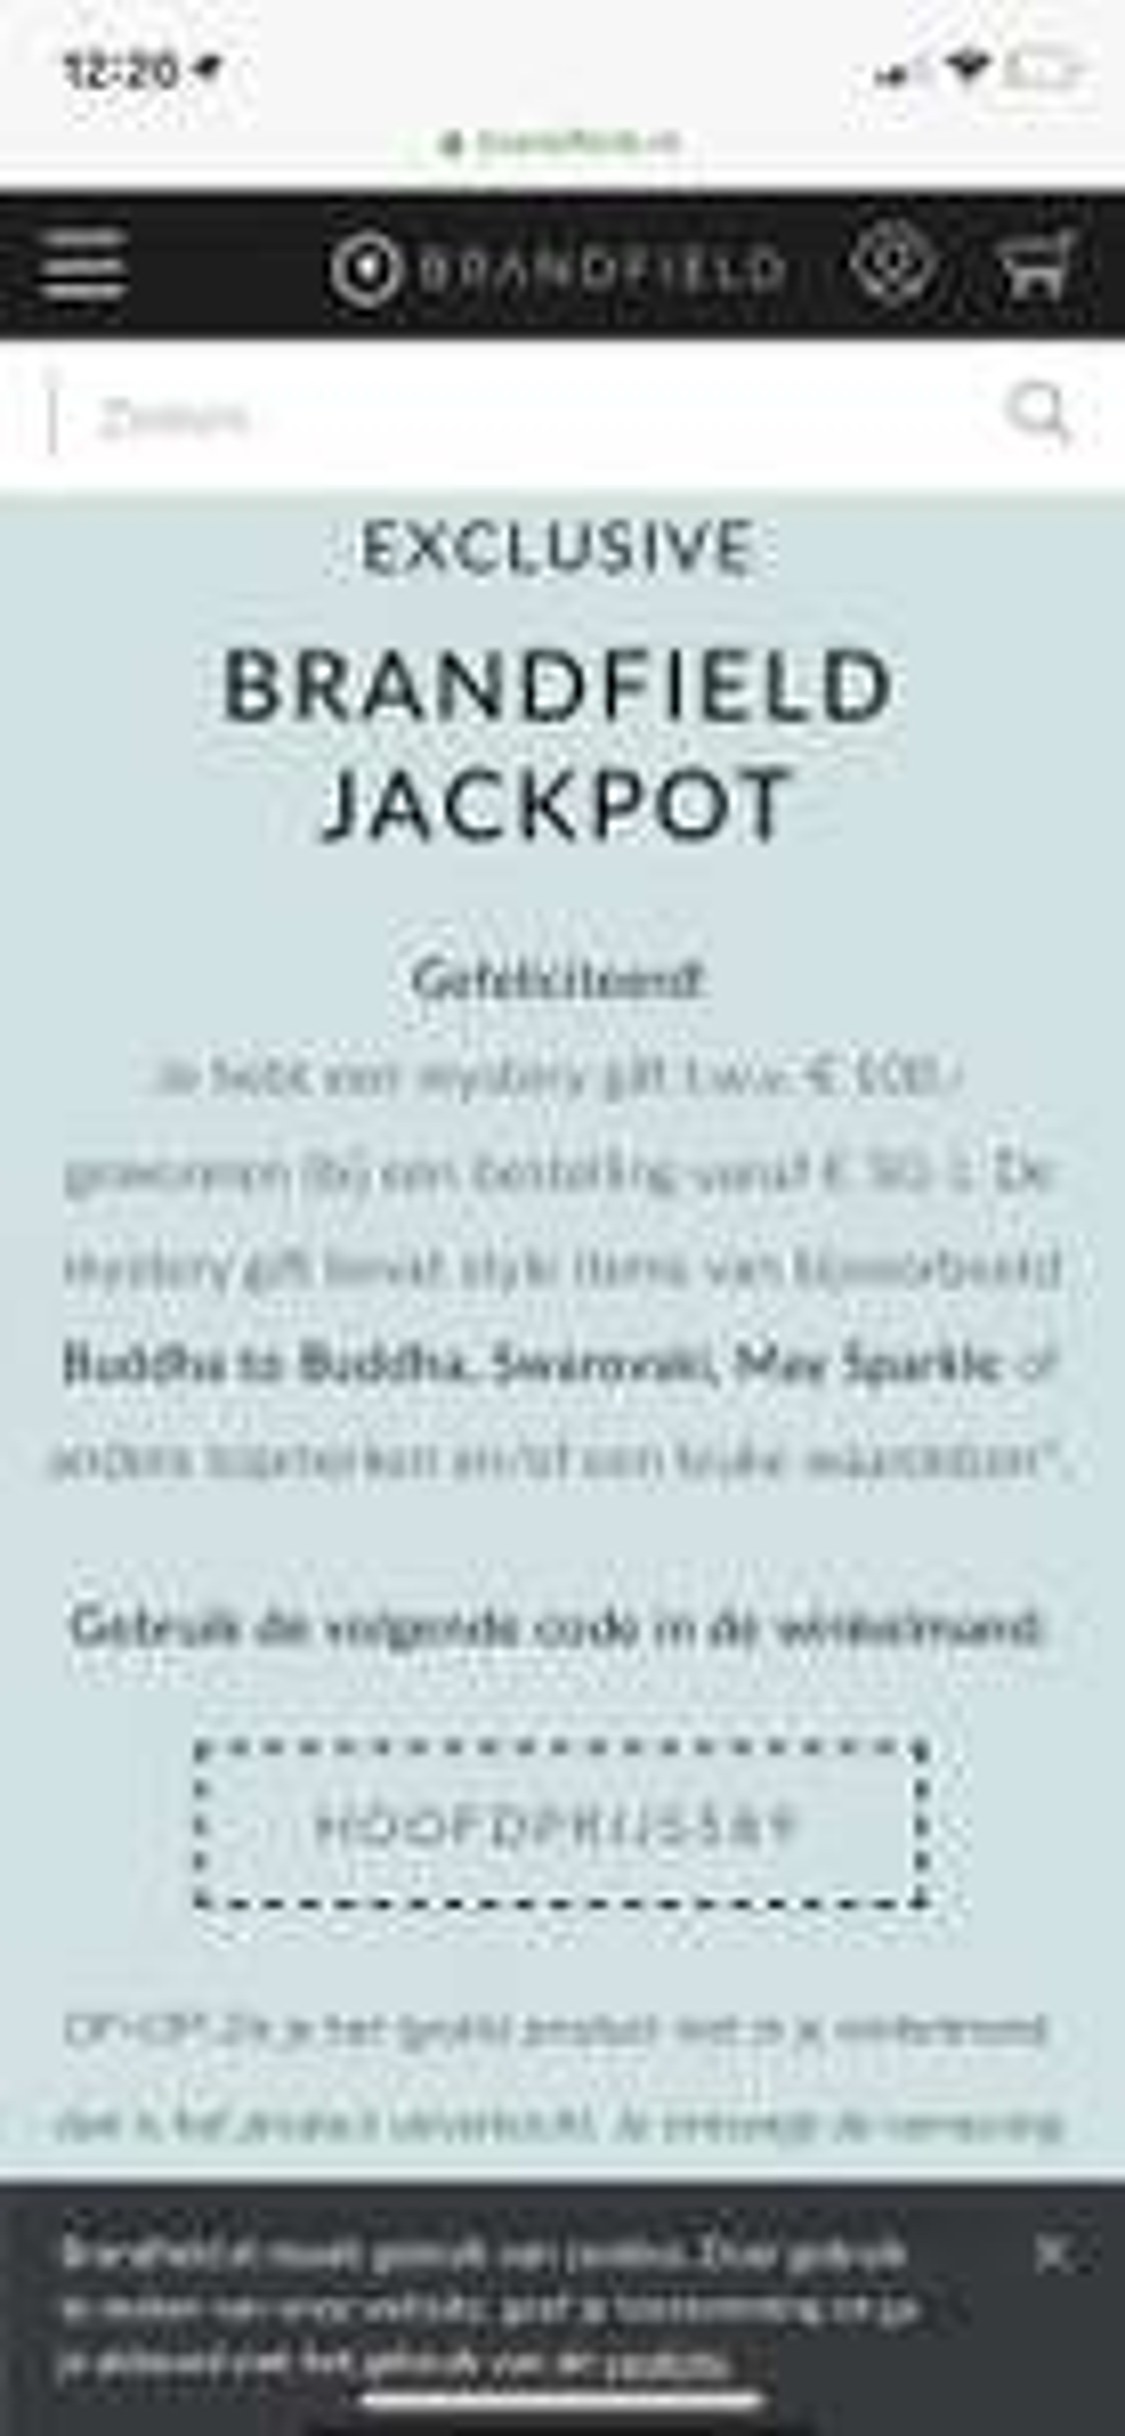 Giftbox twv 100 euro bij besteding van 50 euro BRANDFIELD